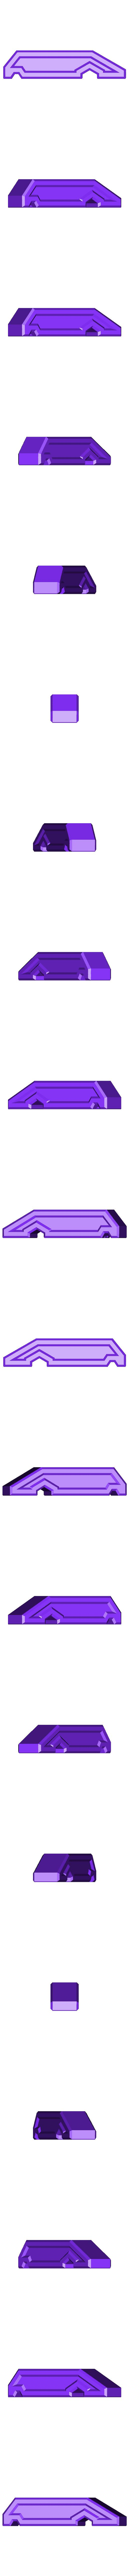 running head.stl Download STL file Monkey wrench fidget toy • 3D print design, glargonoid